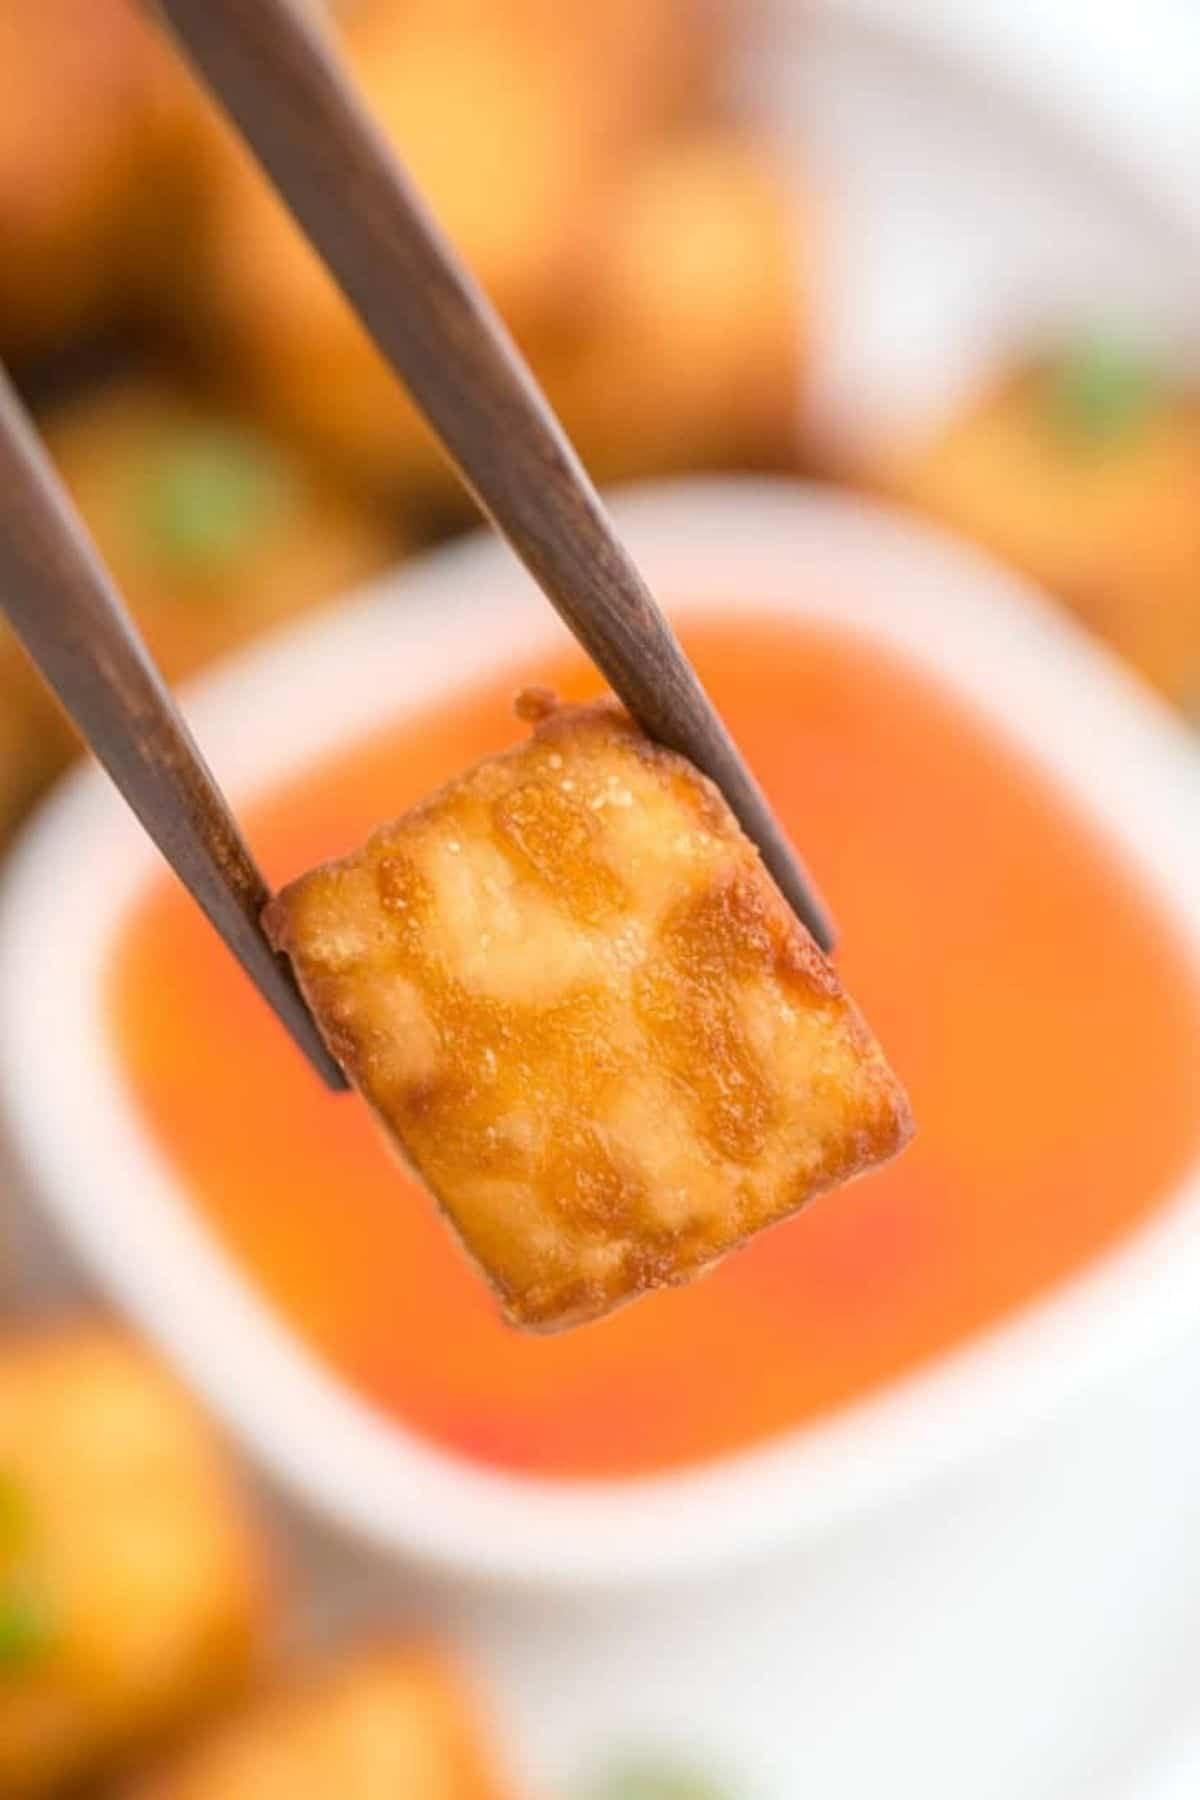 Chopsticks holding piece of toasted tofu above sauce